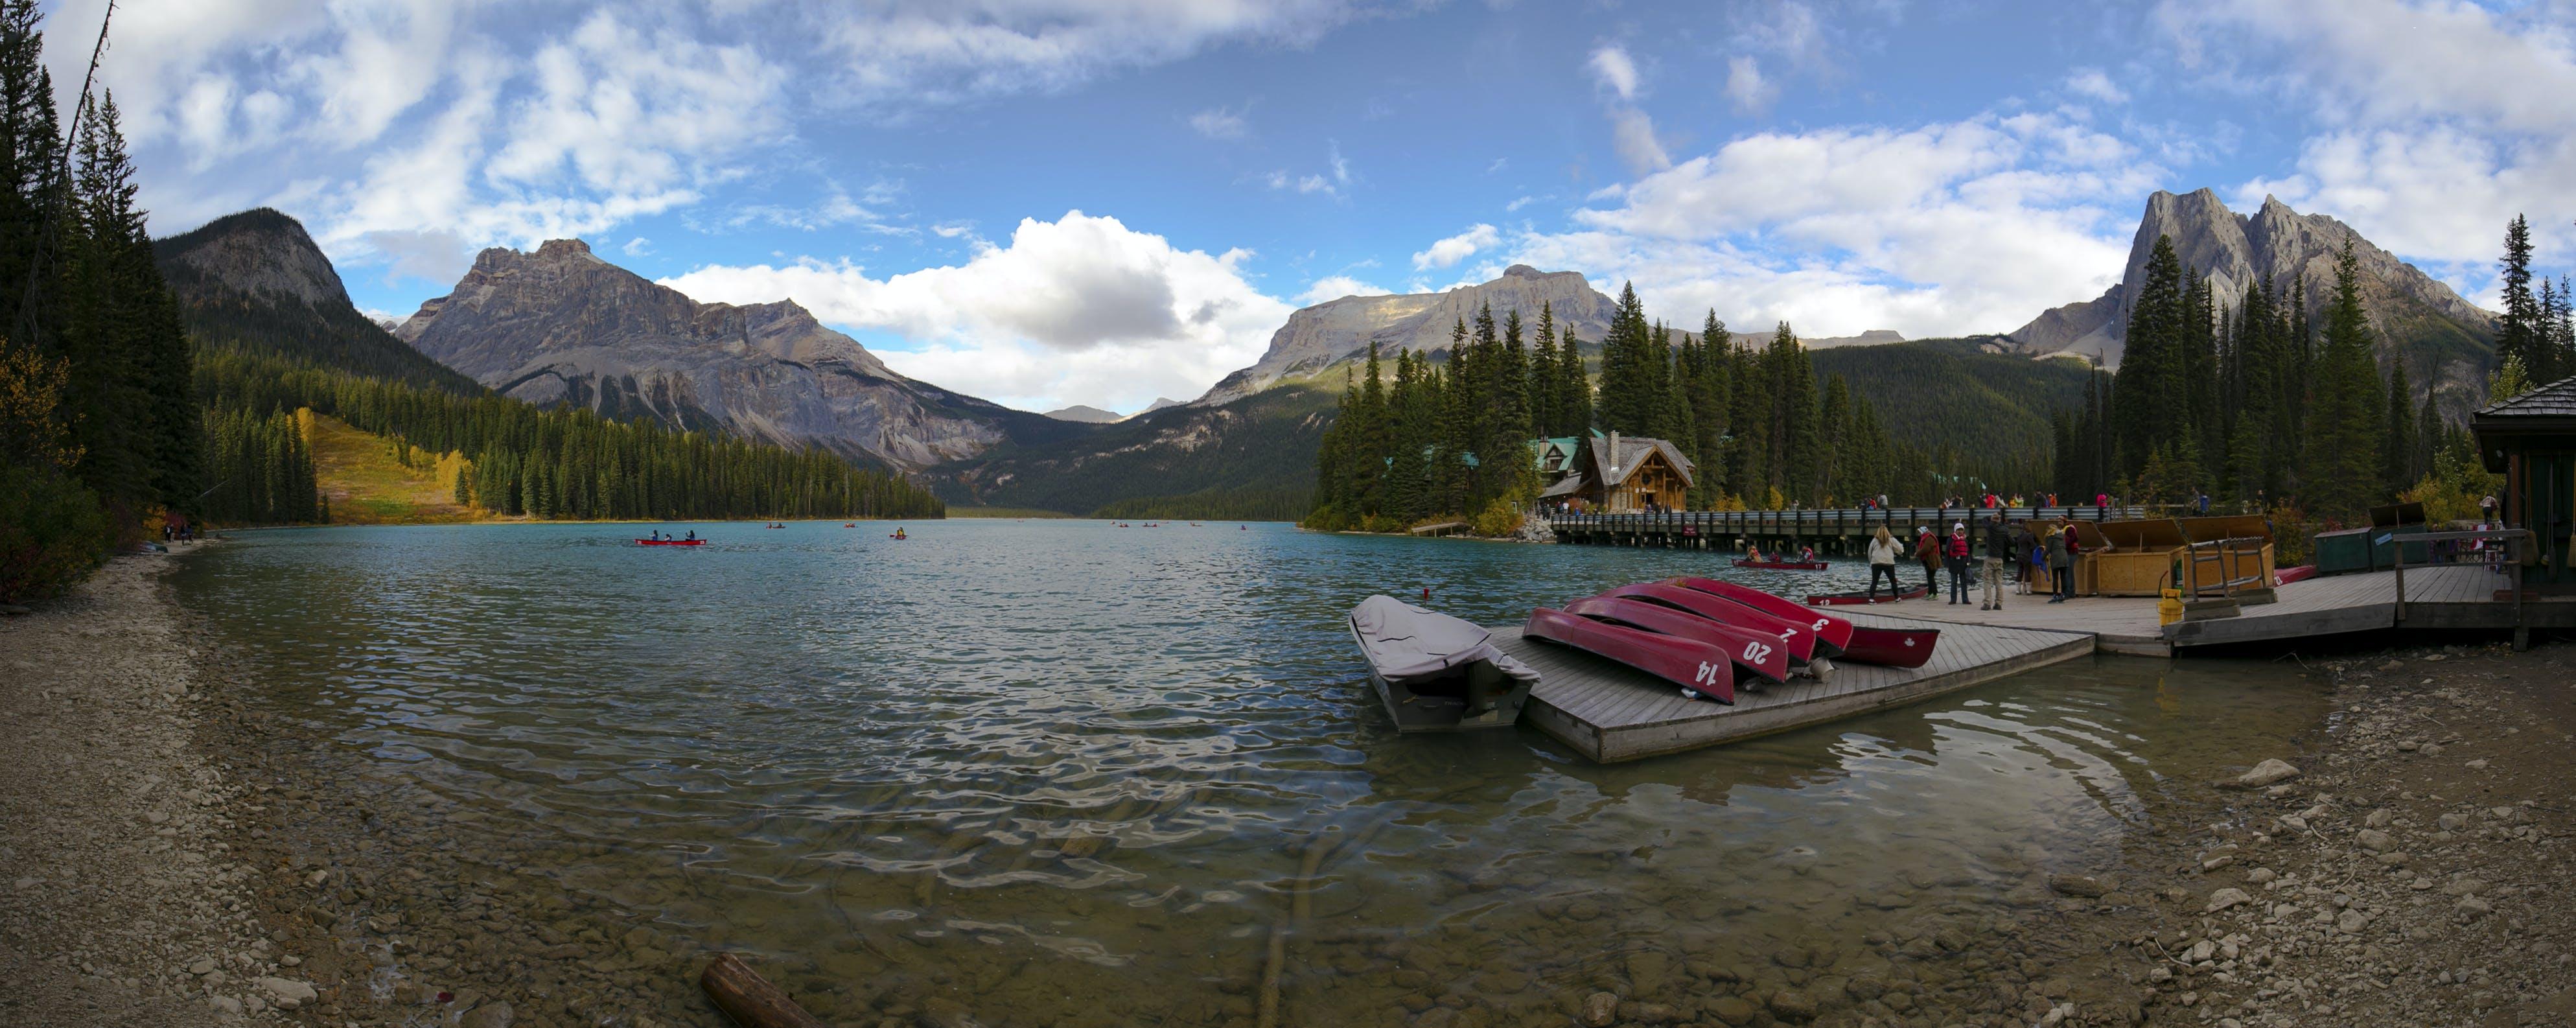 Gratis lagerfoto af british columbia, Canada, smaragd sø